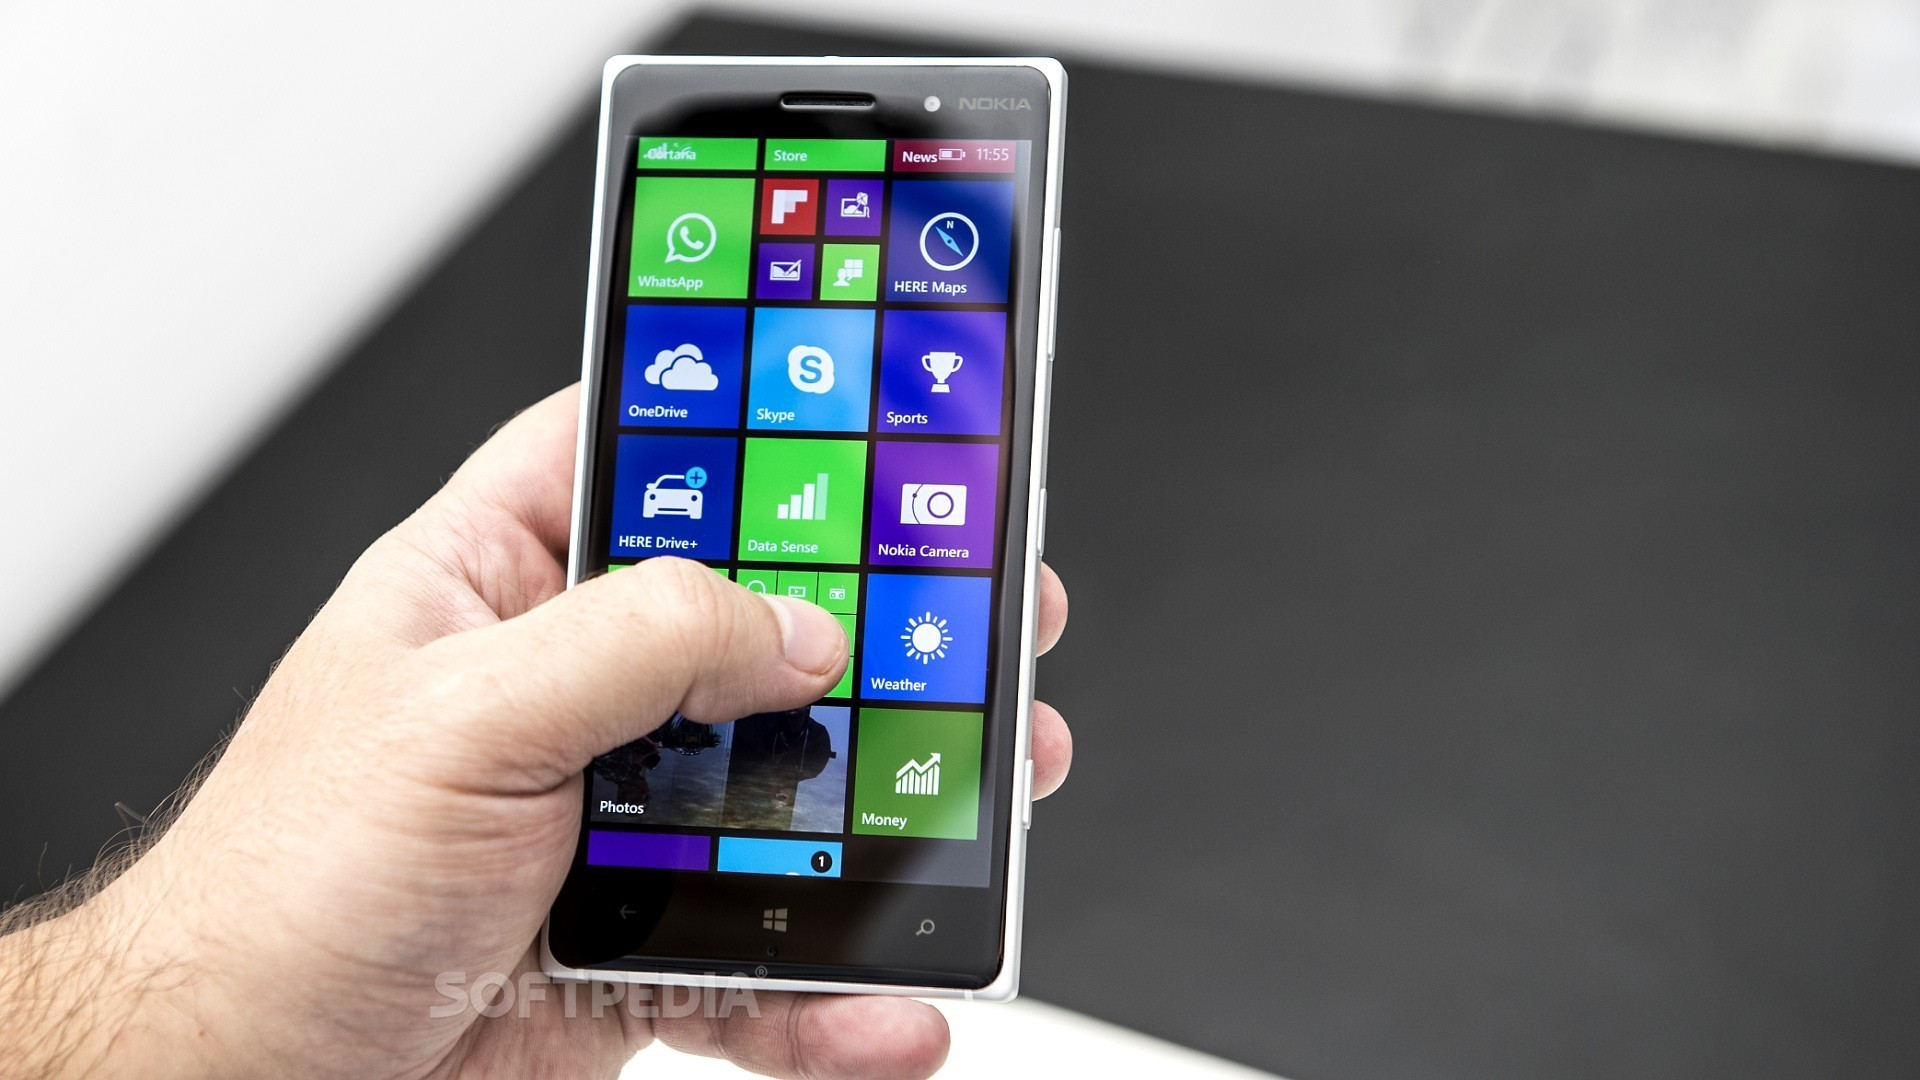 update windows phone 8.1 to windows 10 free